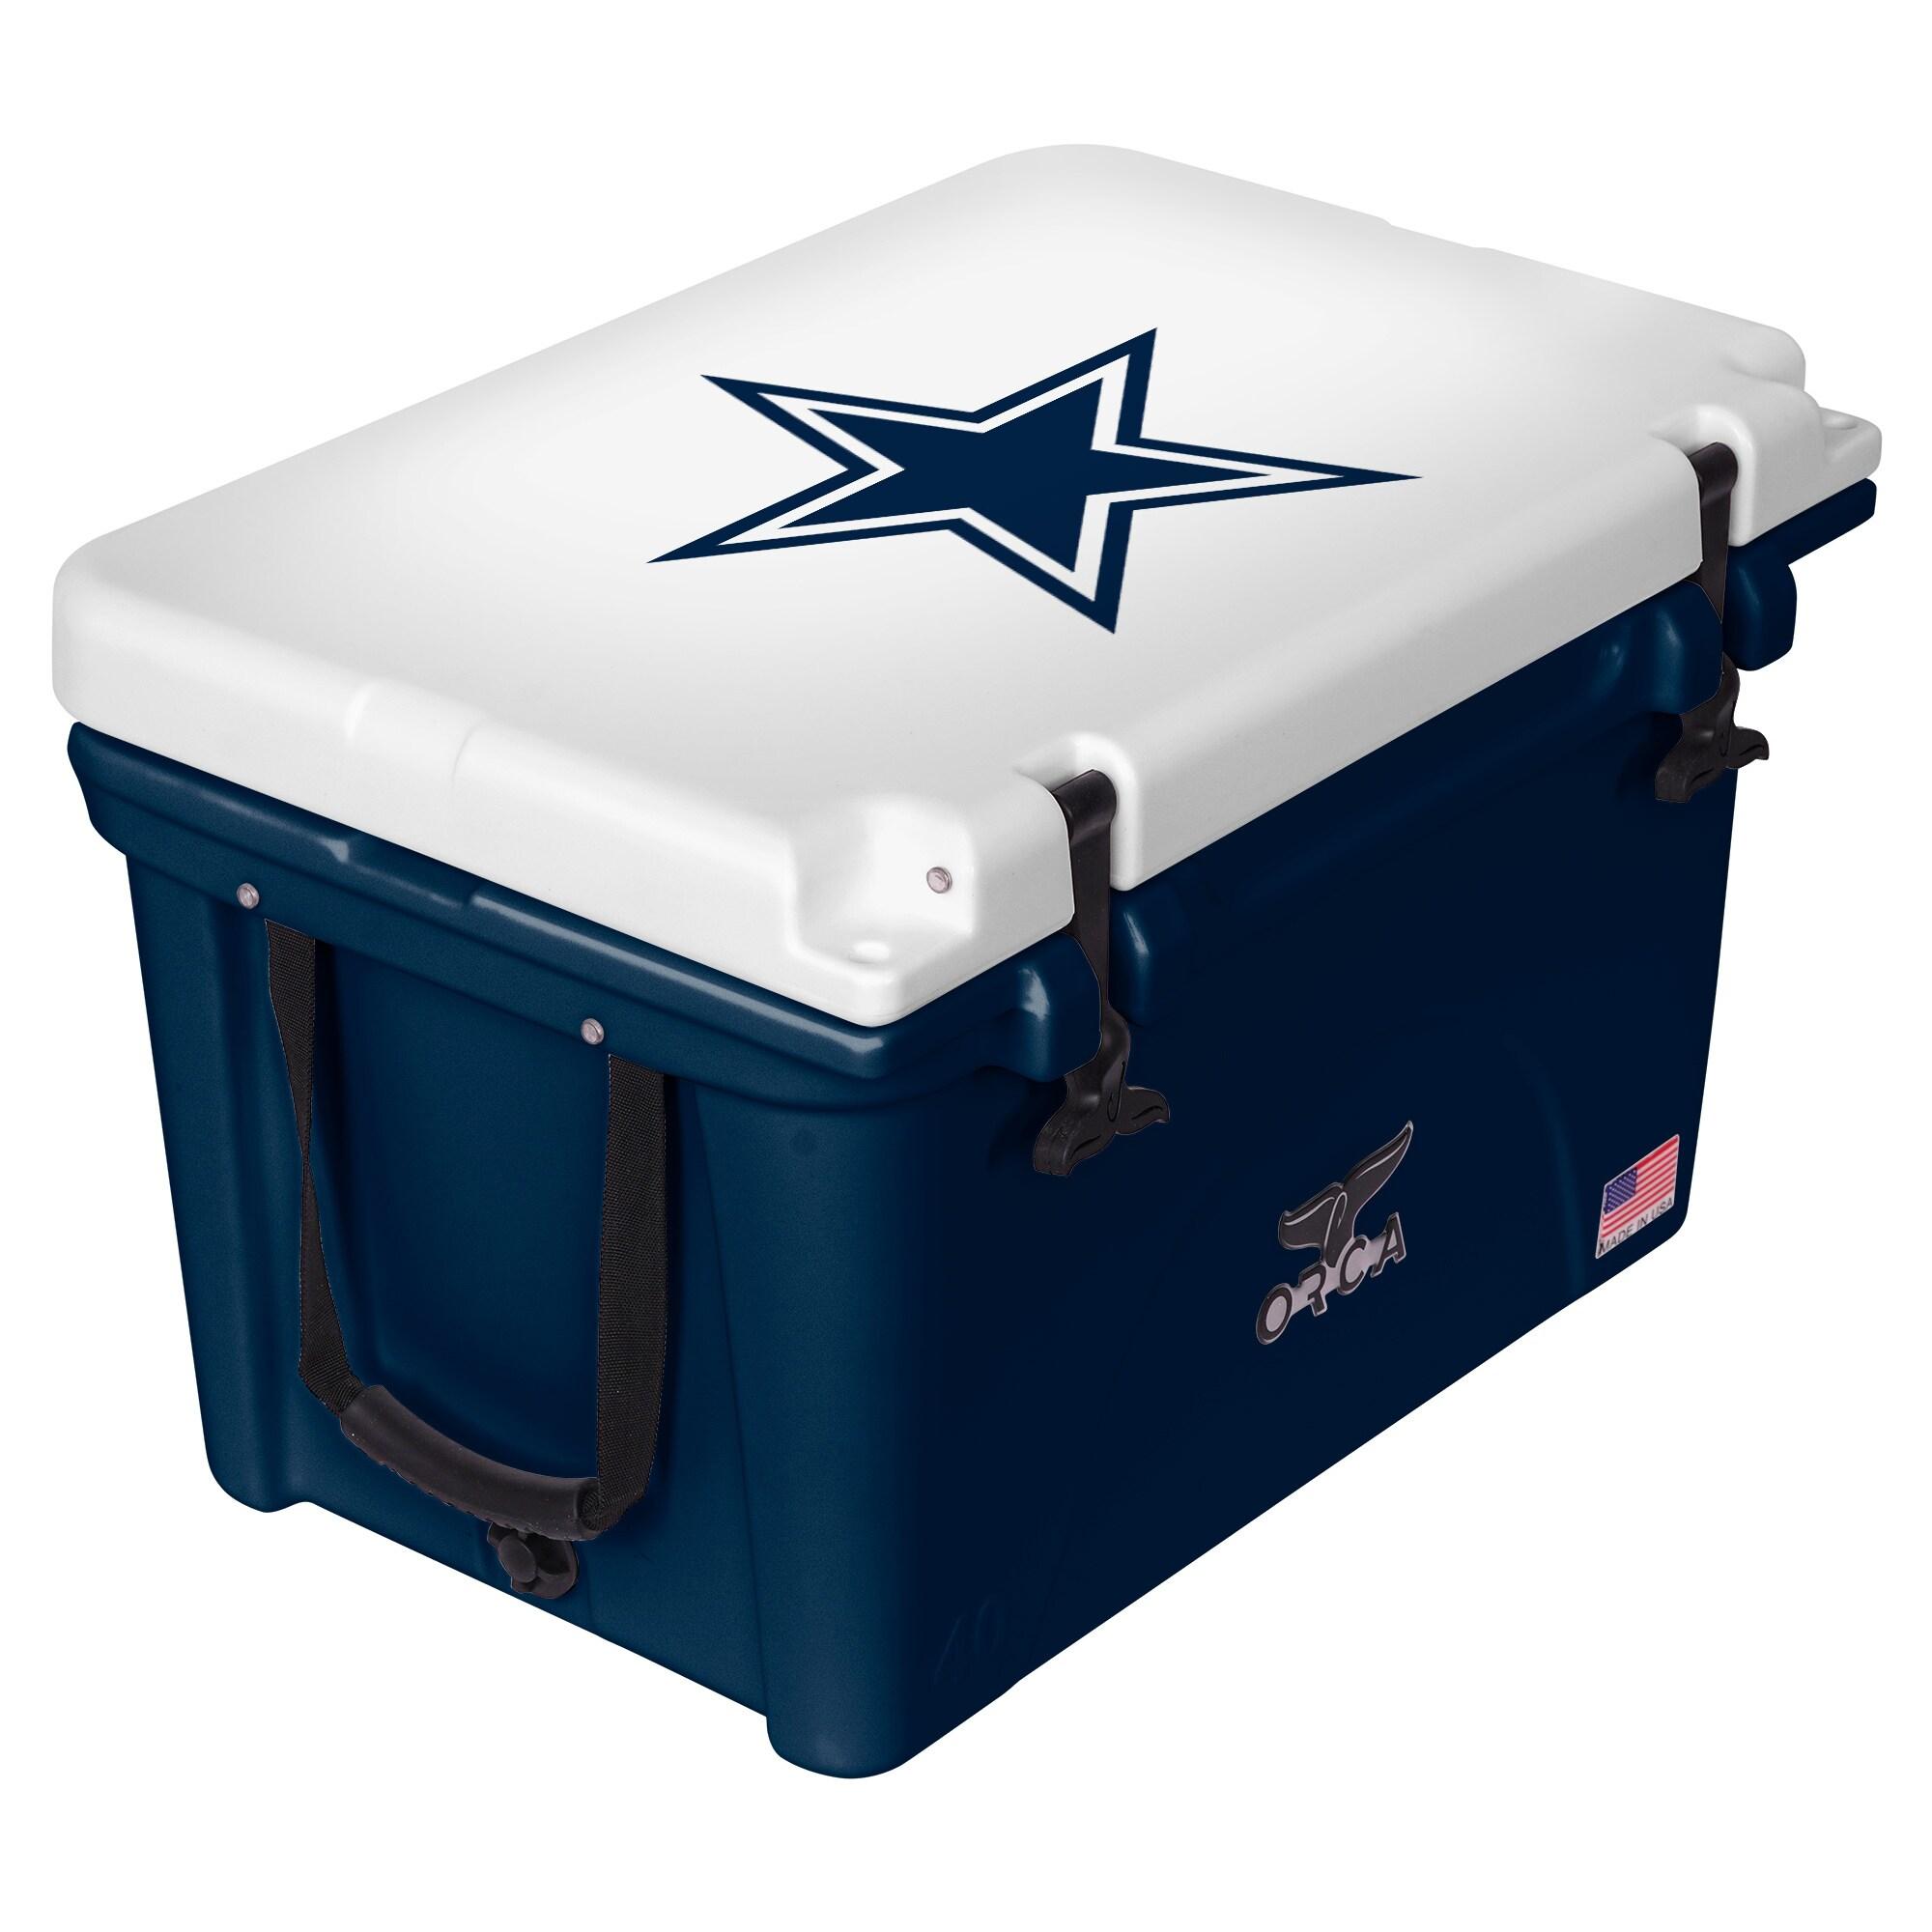 Dallas Cowboys ORCA 40-Quart Hard-Sided Cooler - Navy/White